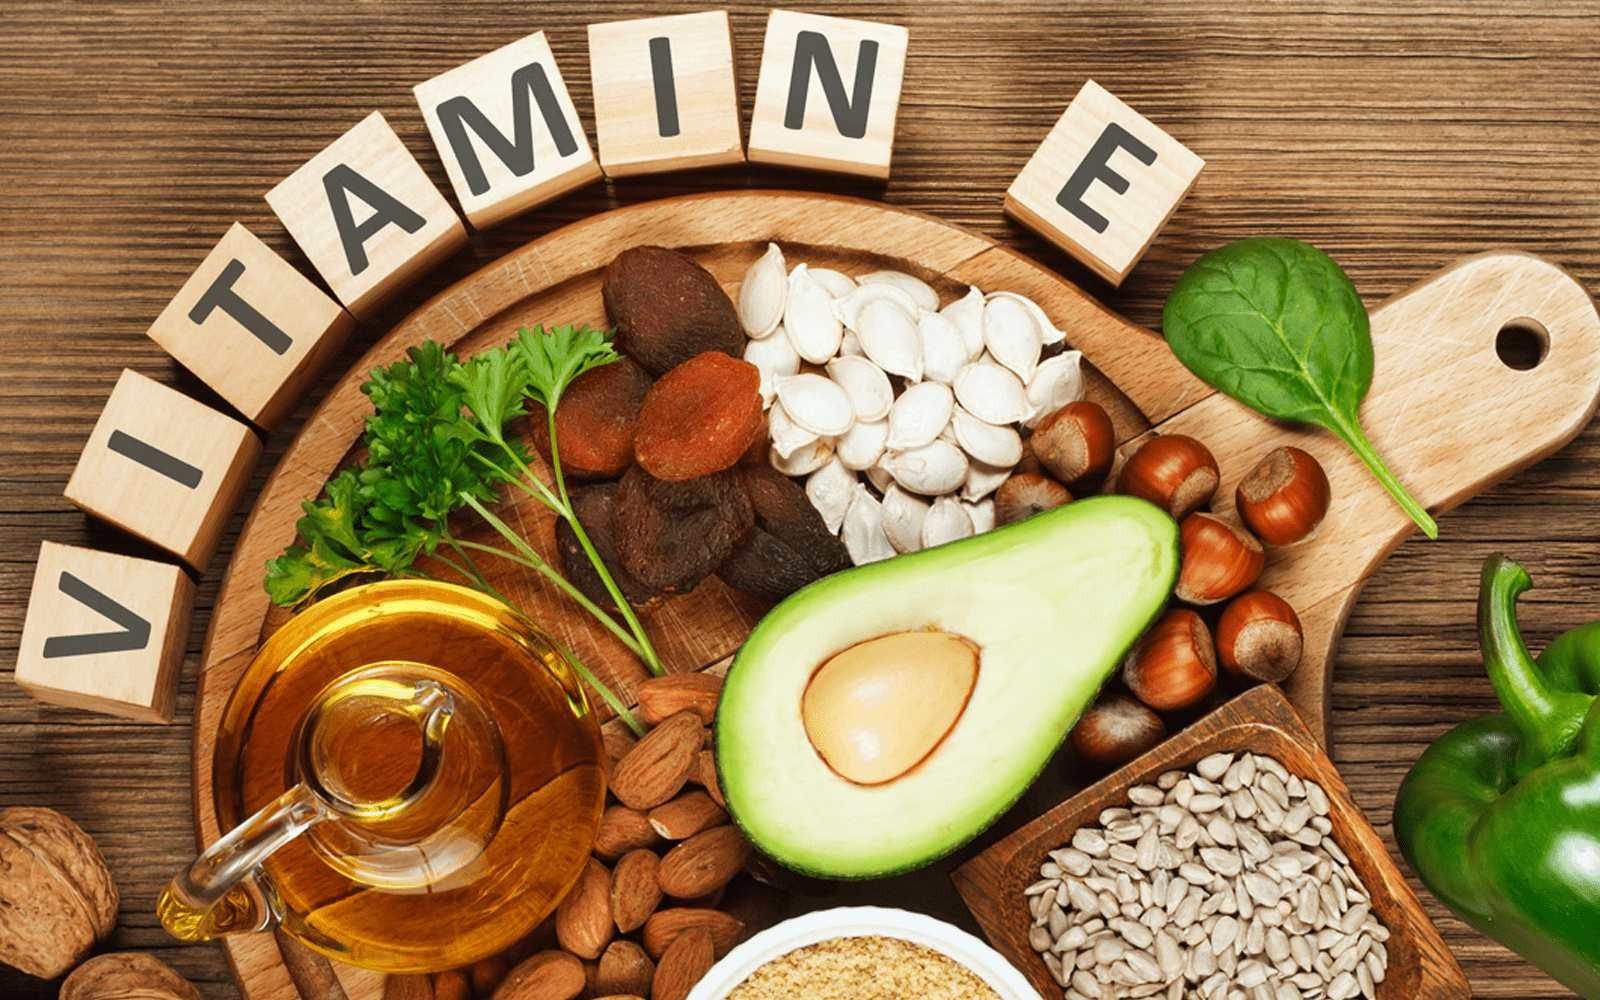 Vitamin E untuk Cegah Komplikasi Diabetes, Apa Efektif?